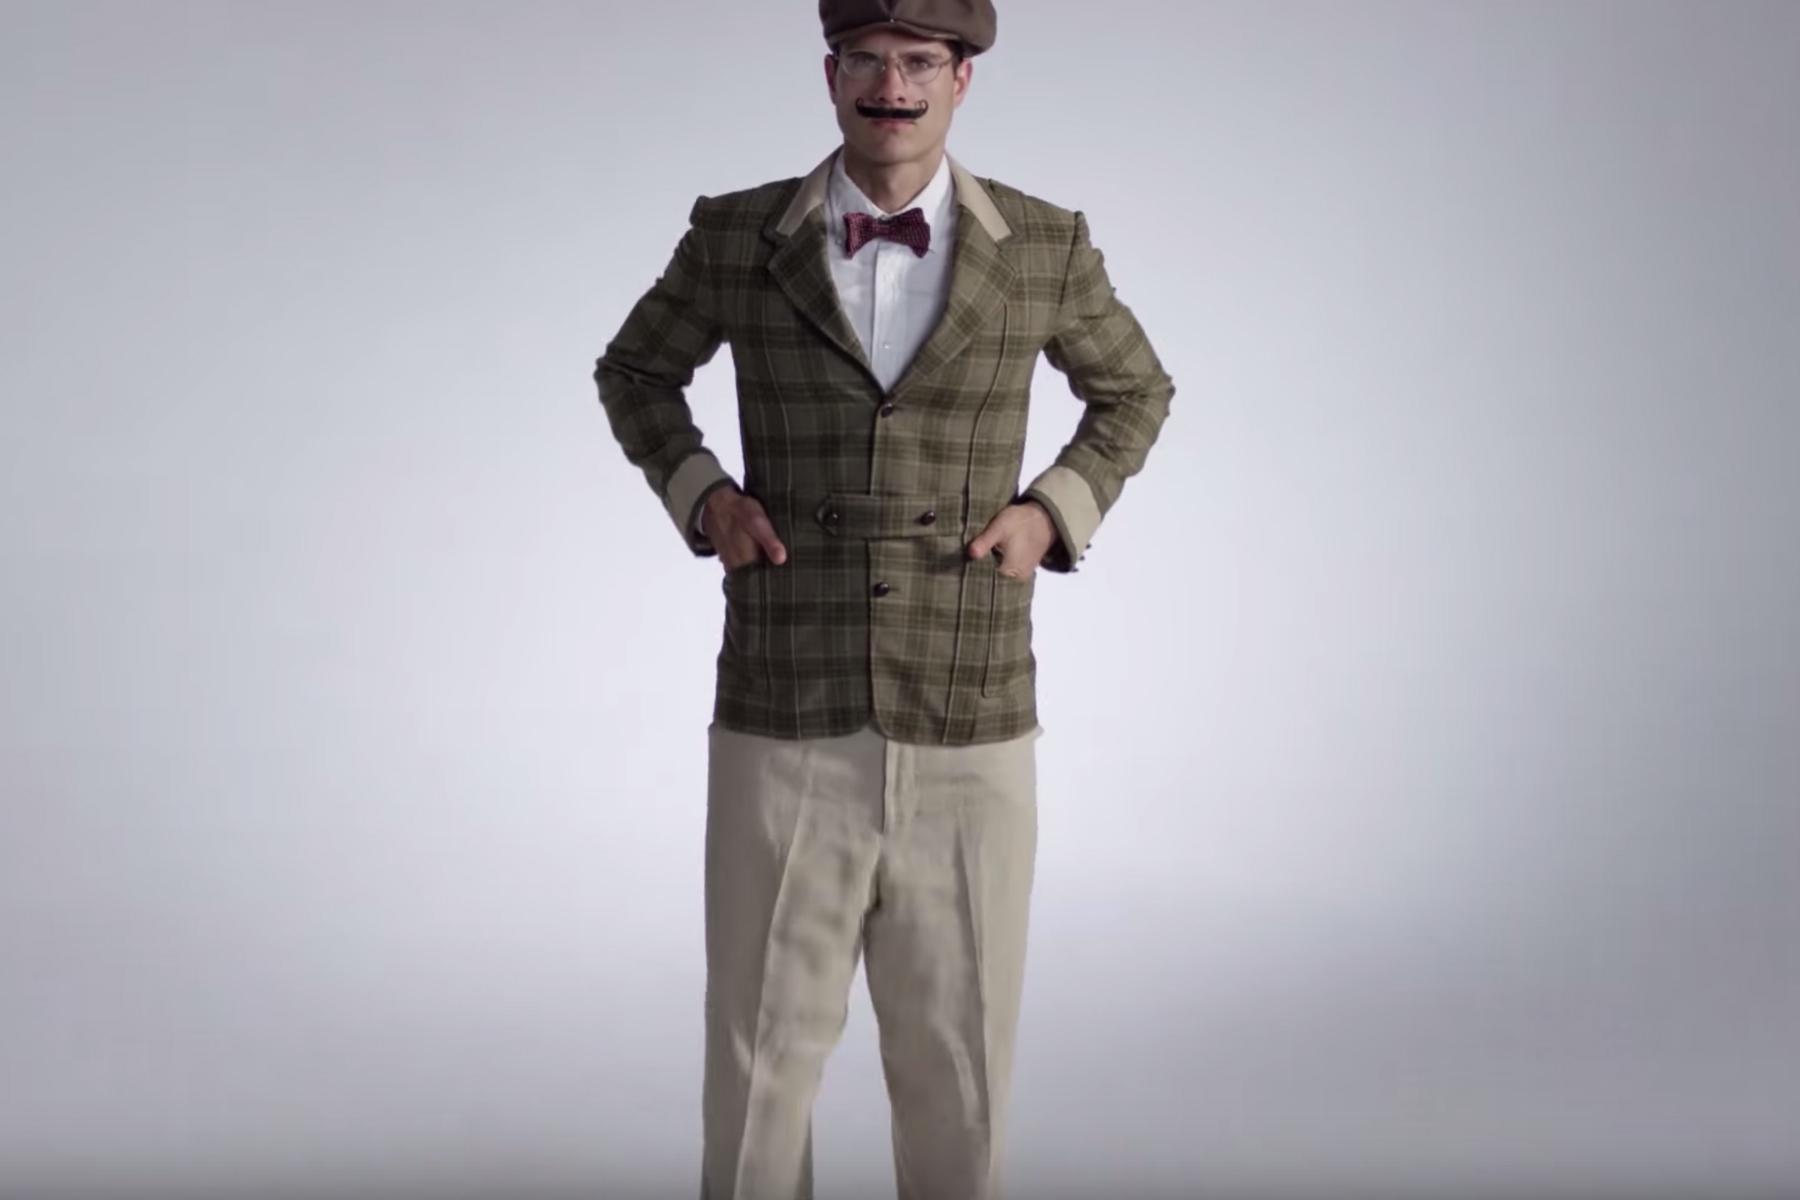 MODE Recaps 100 Years of Men's Fashion